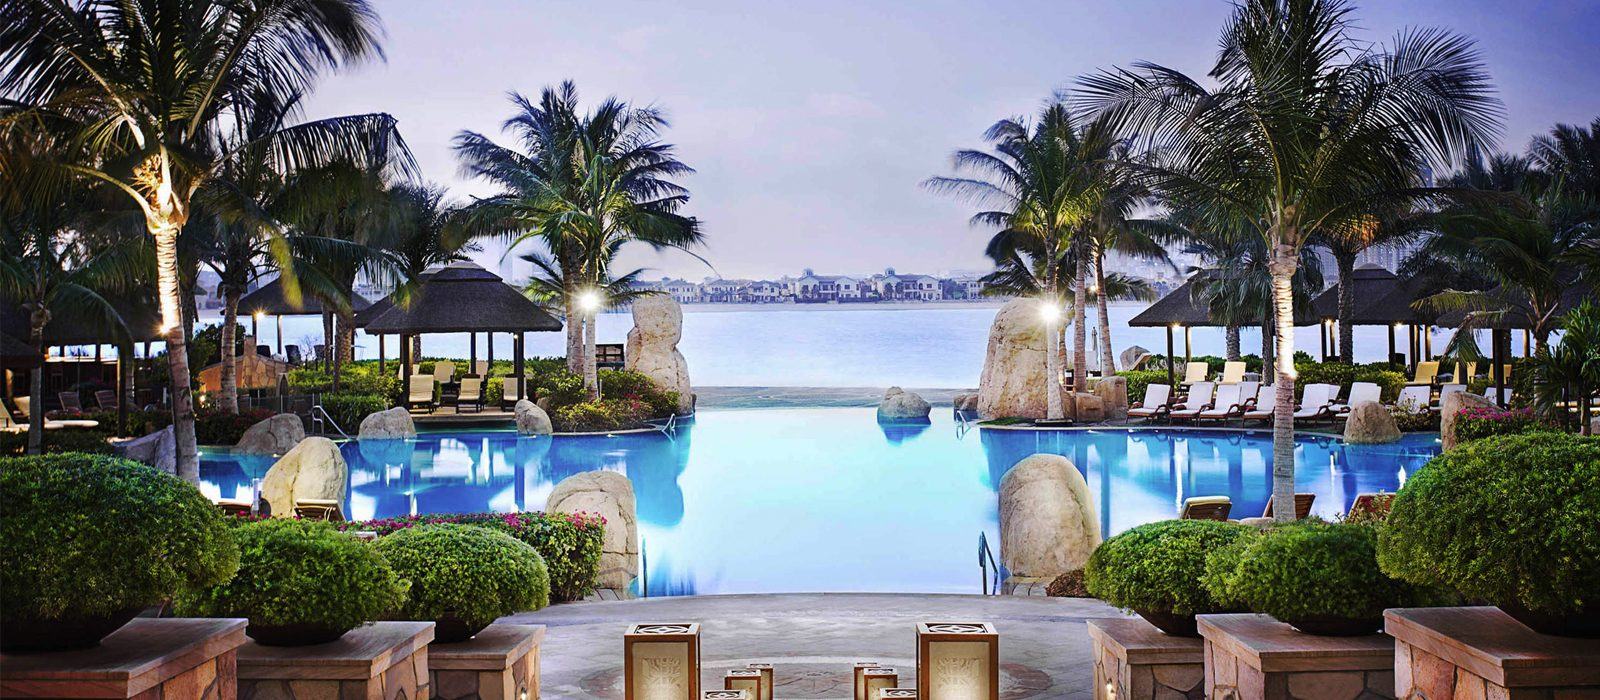 Luxury Dubai Holiday Packages Sofitel The Palm Dubai Header